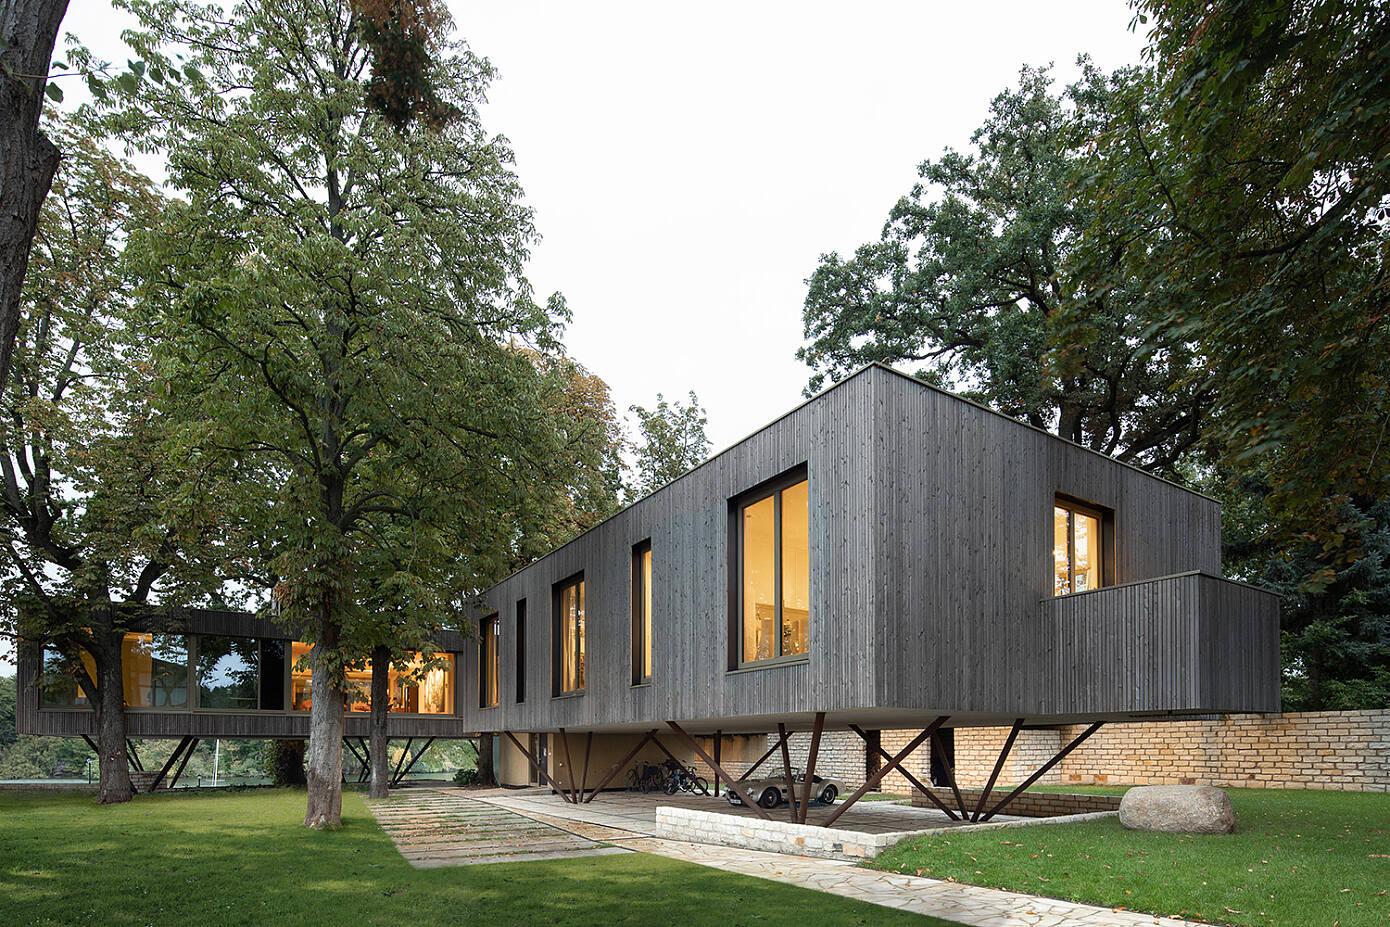 House by the Lake by Carlos Zwick Architekten